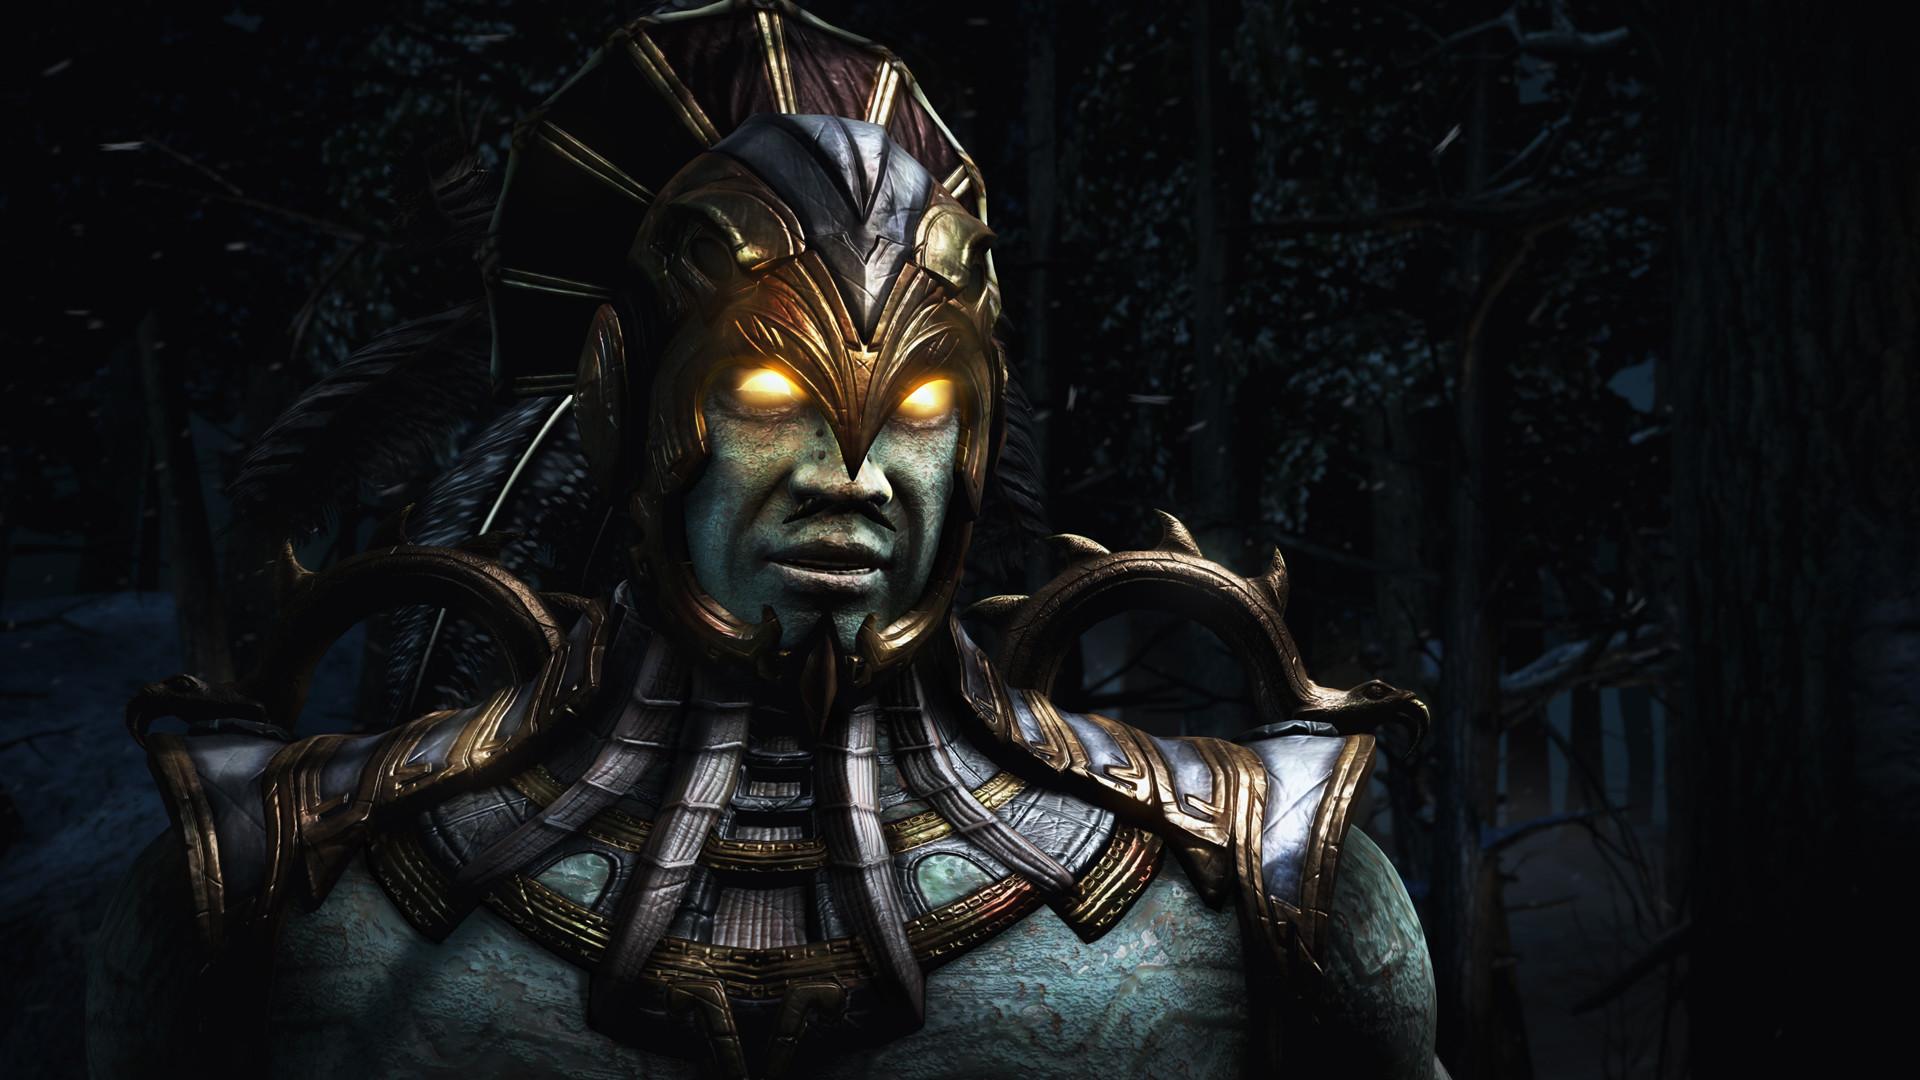 Mortal Kombat X Characters Wallpaper